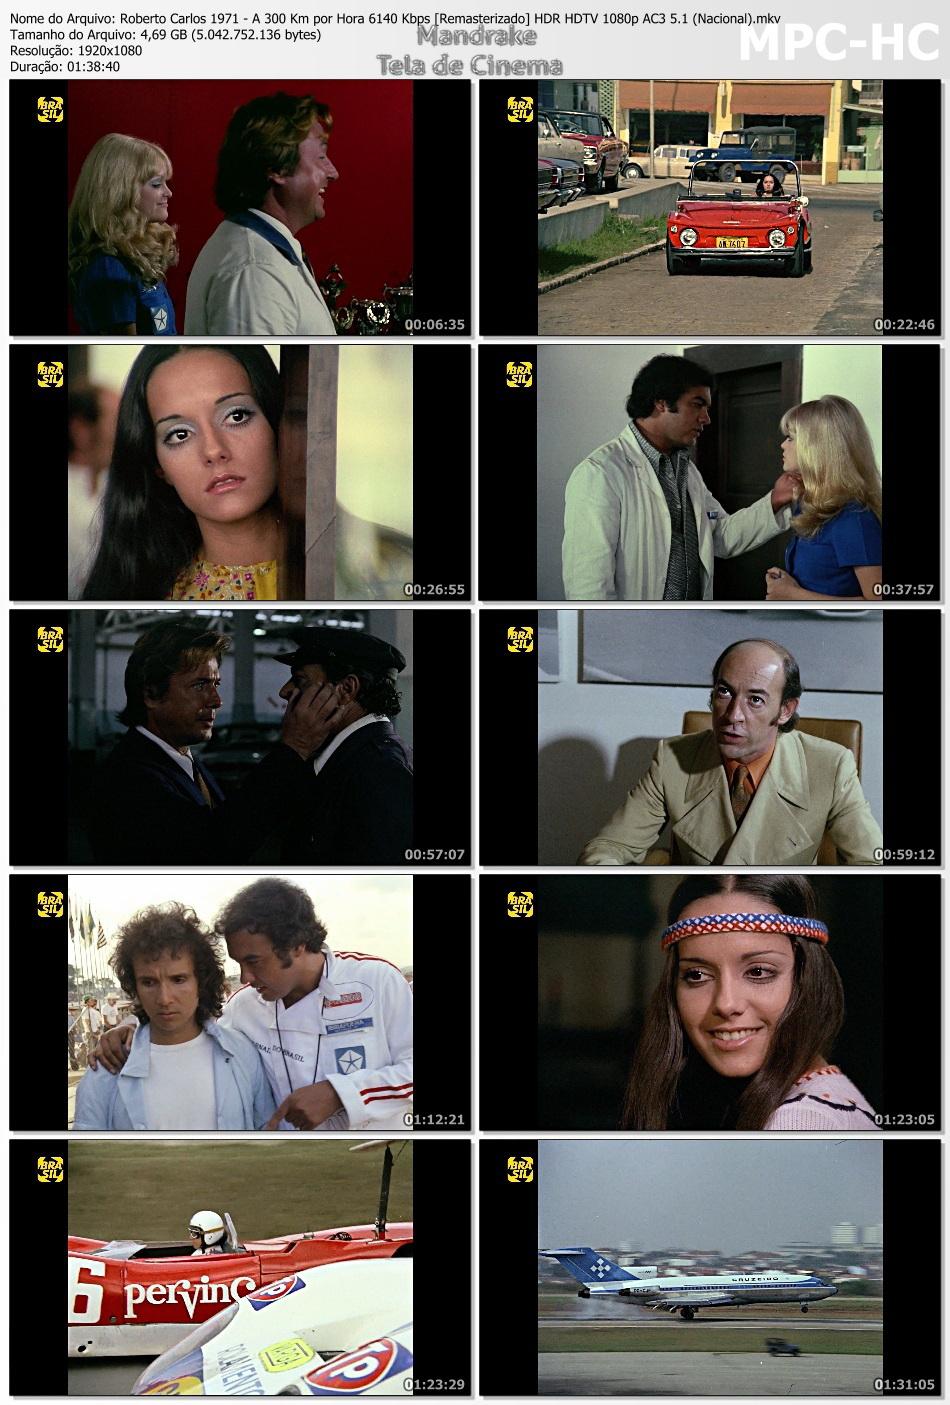 ROBERTO CARLOS A 300 KM POR HORA (HDTV/NACIONAL/1080P) - 1971 RC%2B1971%2B00